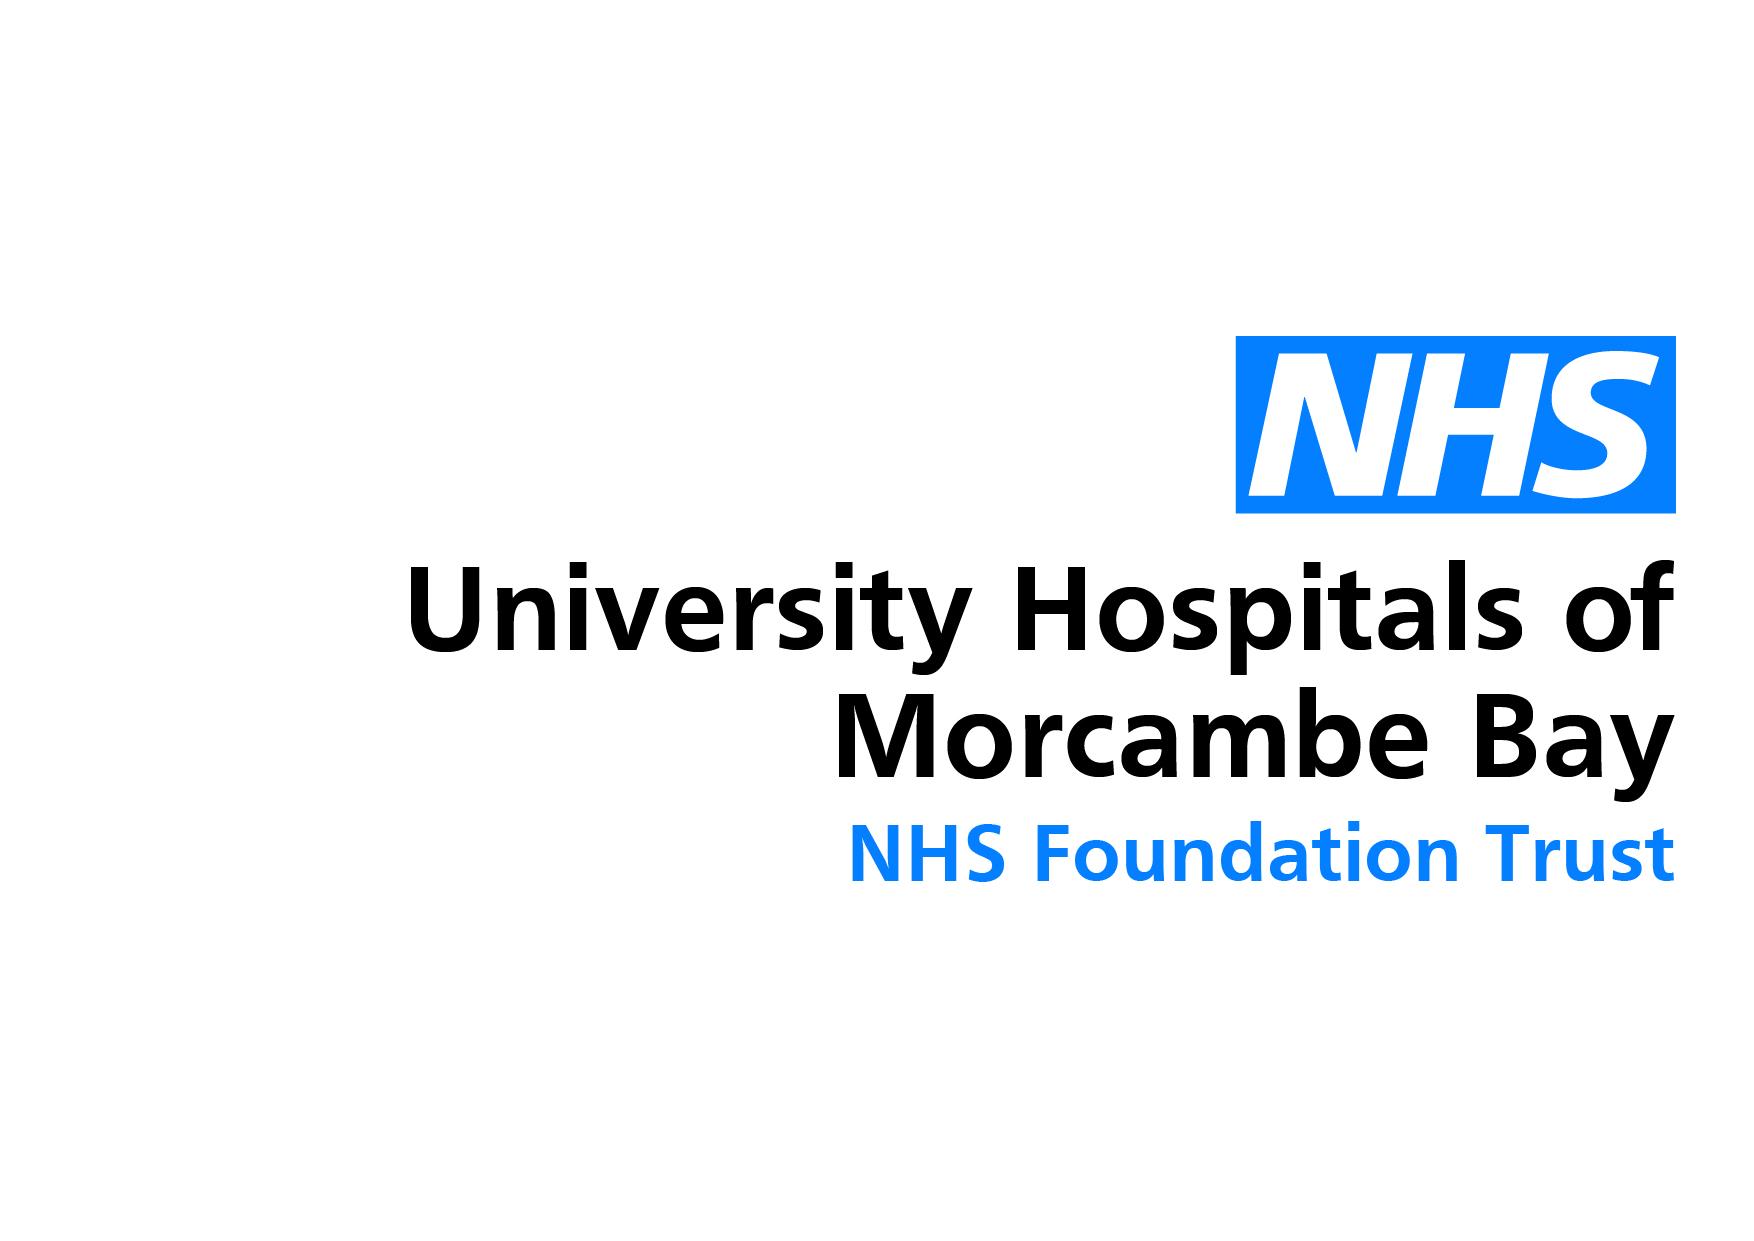 University Hospitals of Morcambe Bay NHS Logo